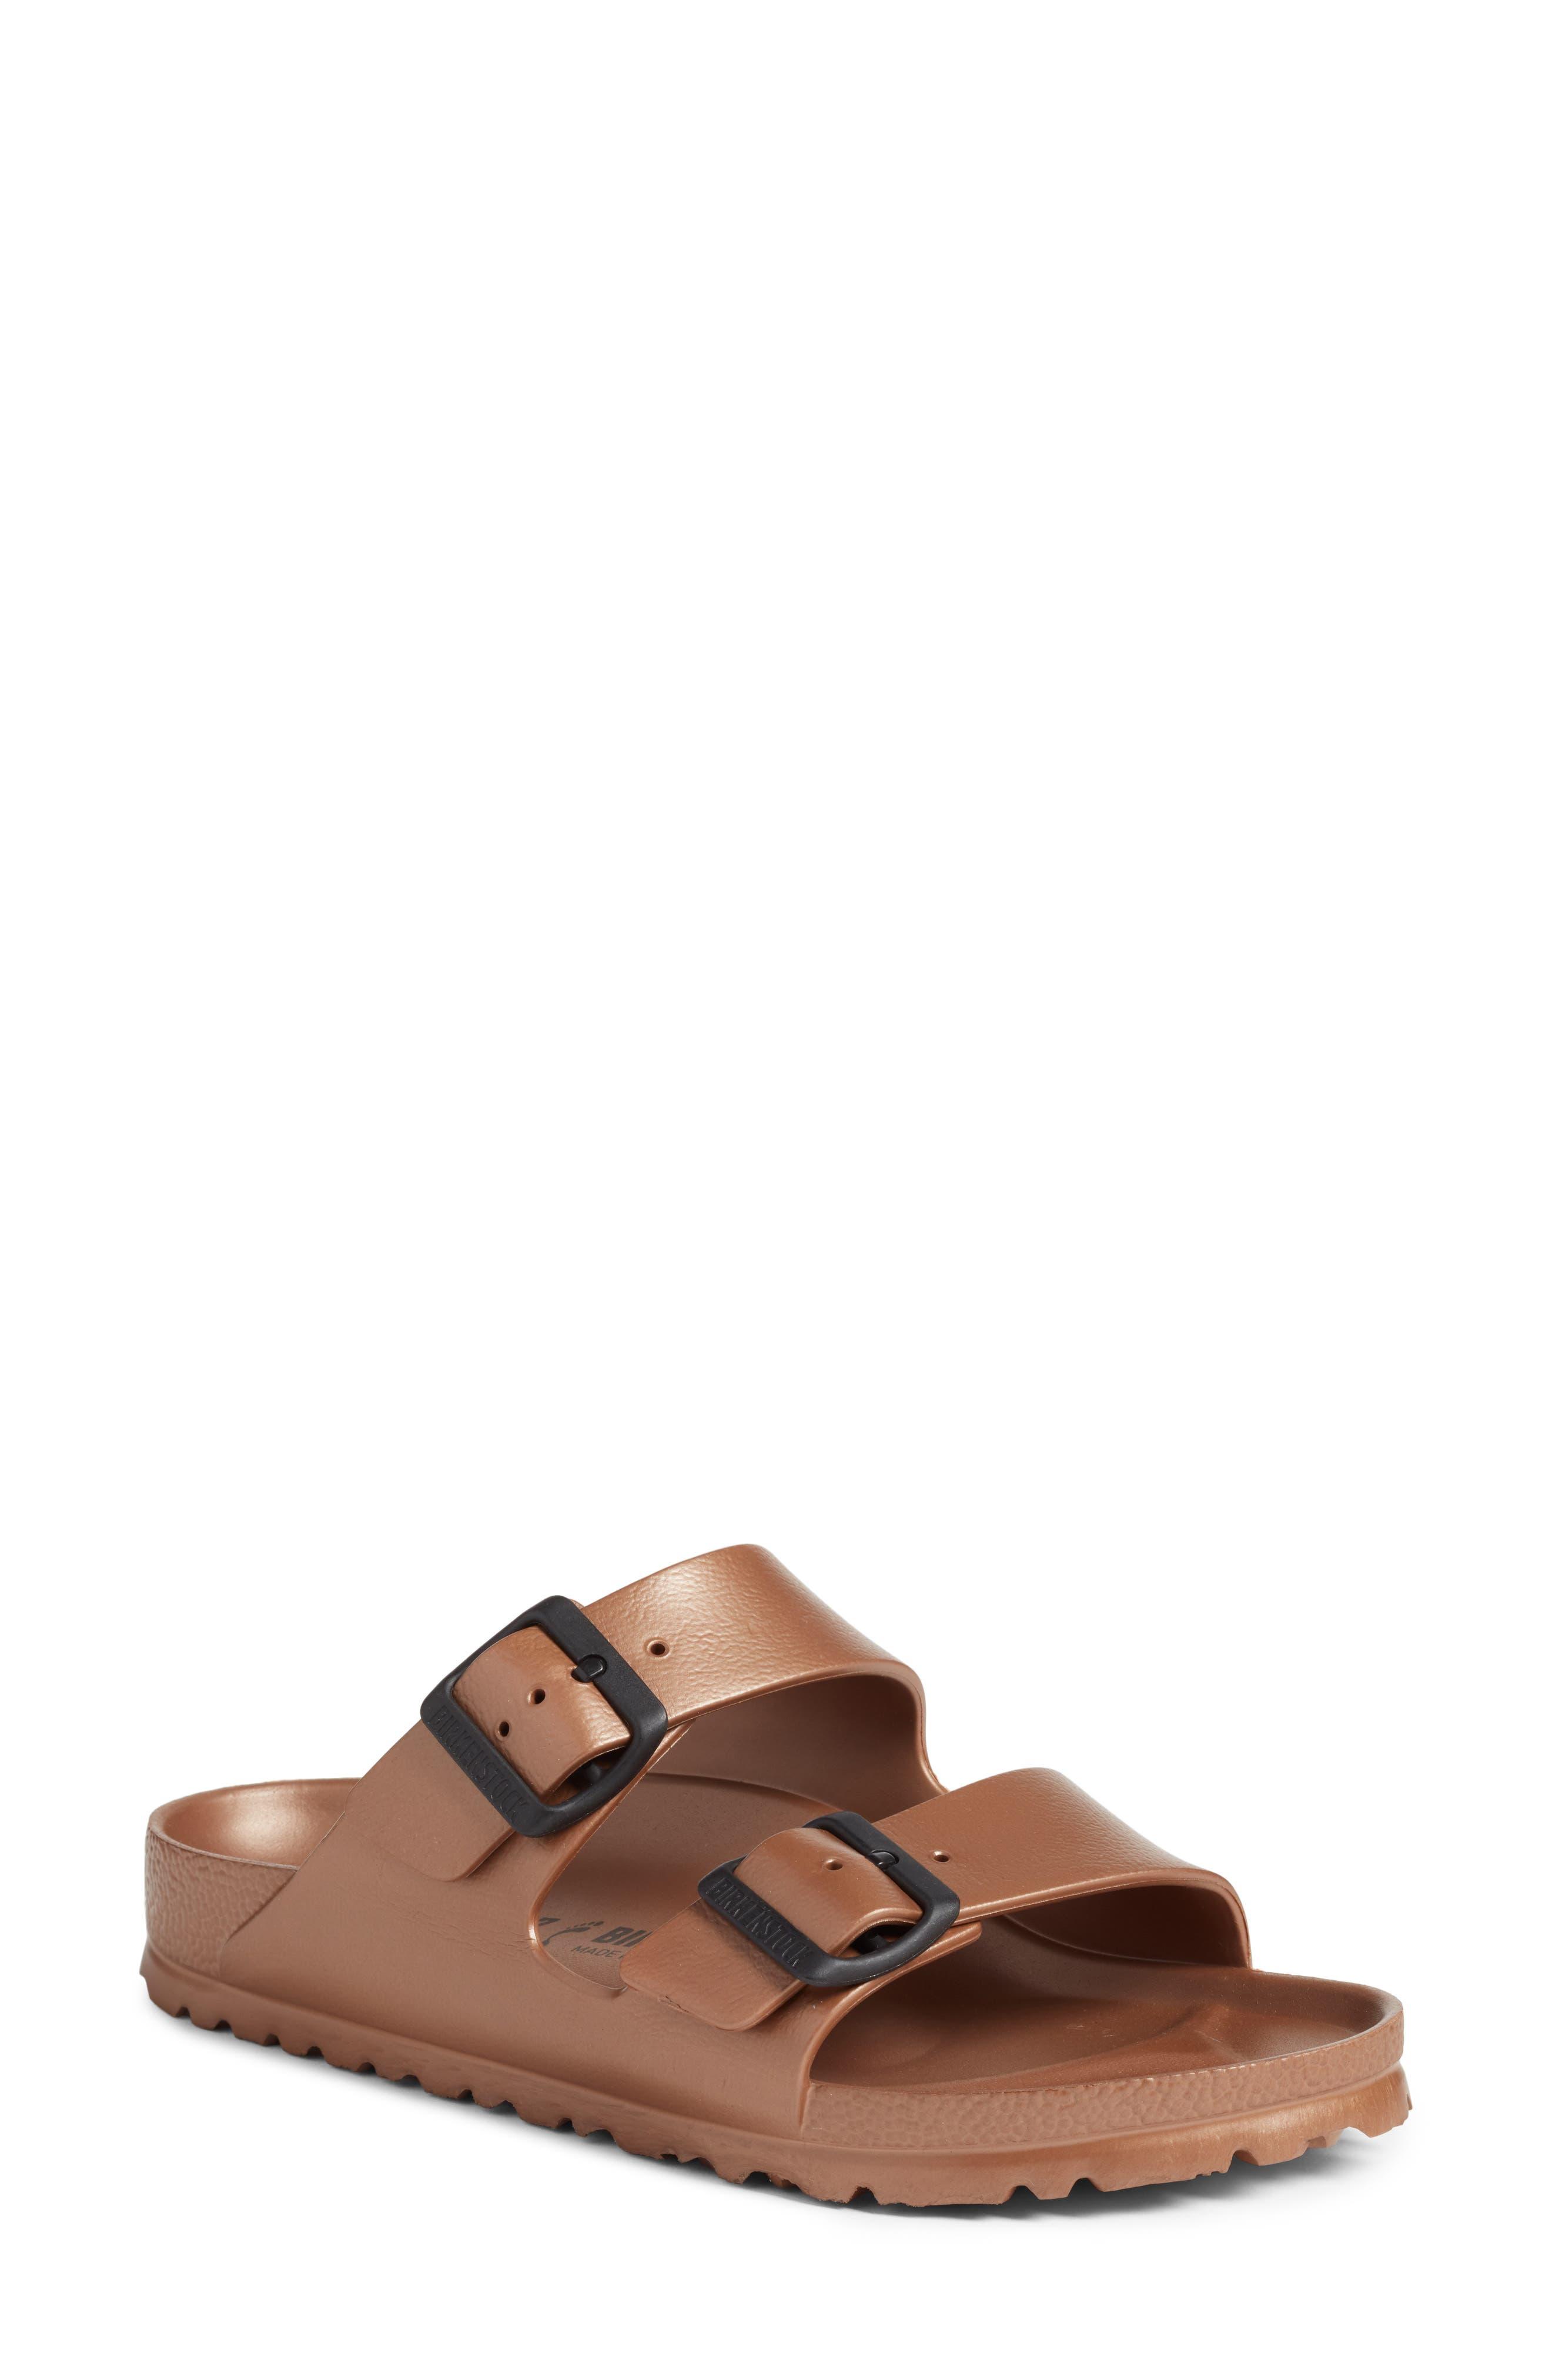 Essentials - Arizona Slide Sandal,                             Main thumbnail 1, color,                             Metallic Copper